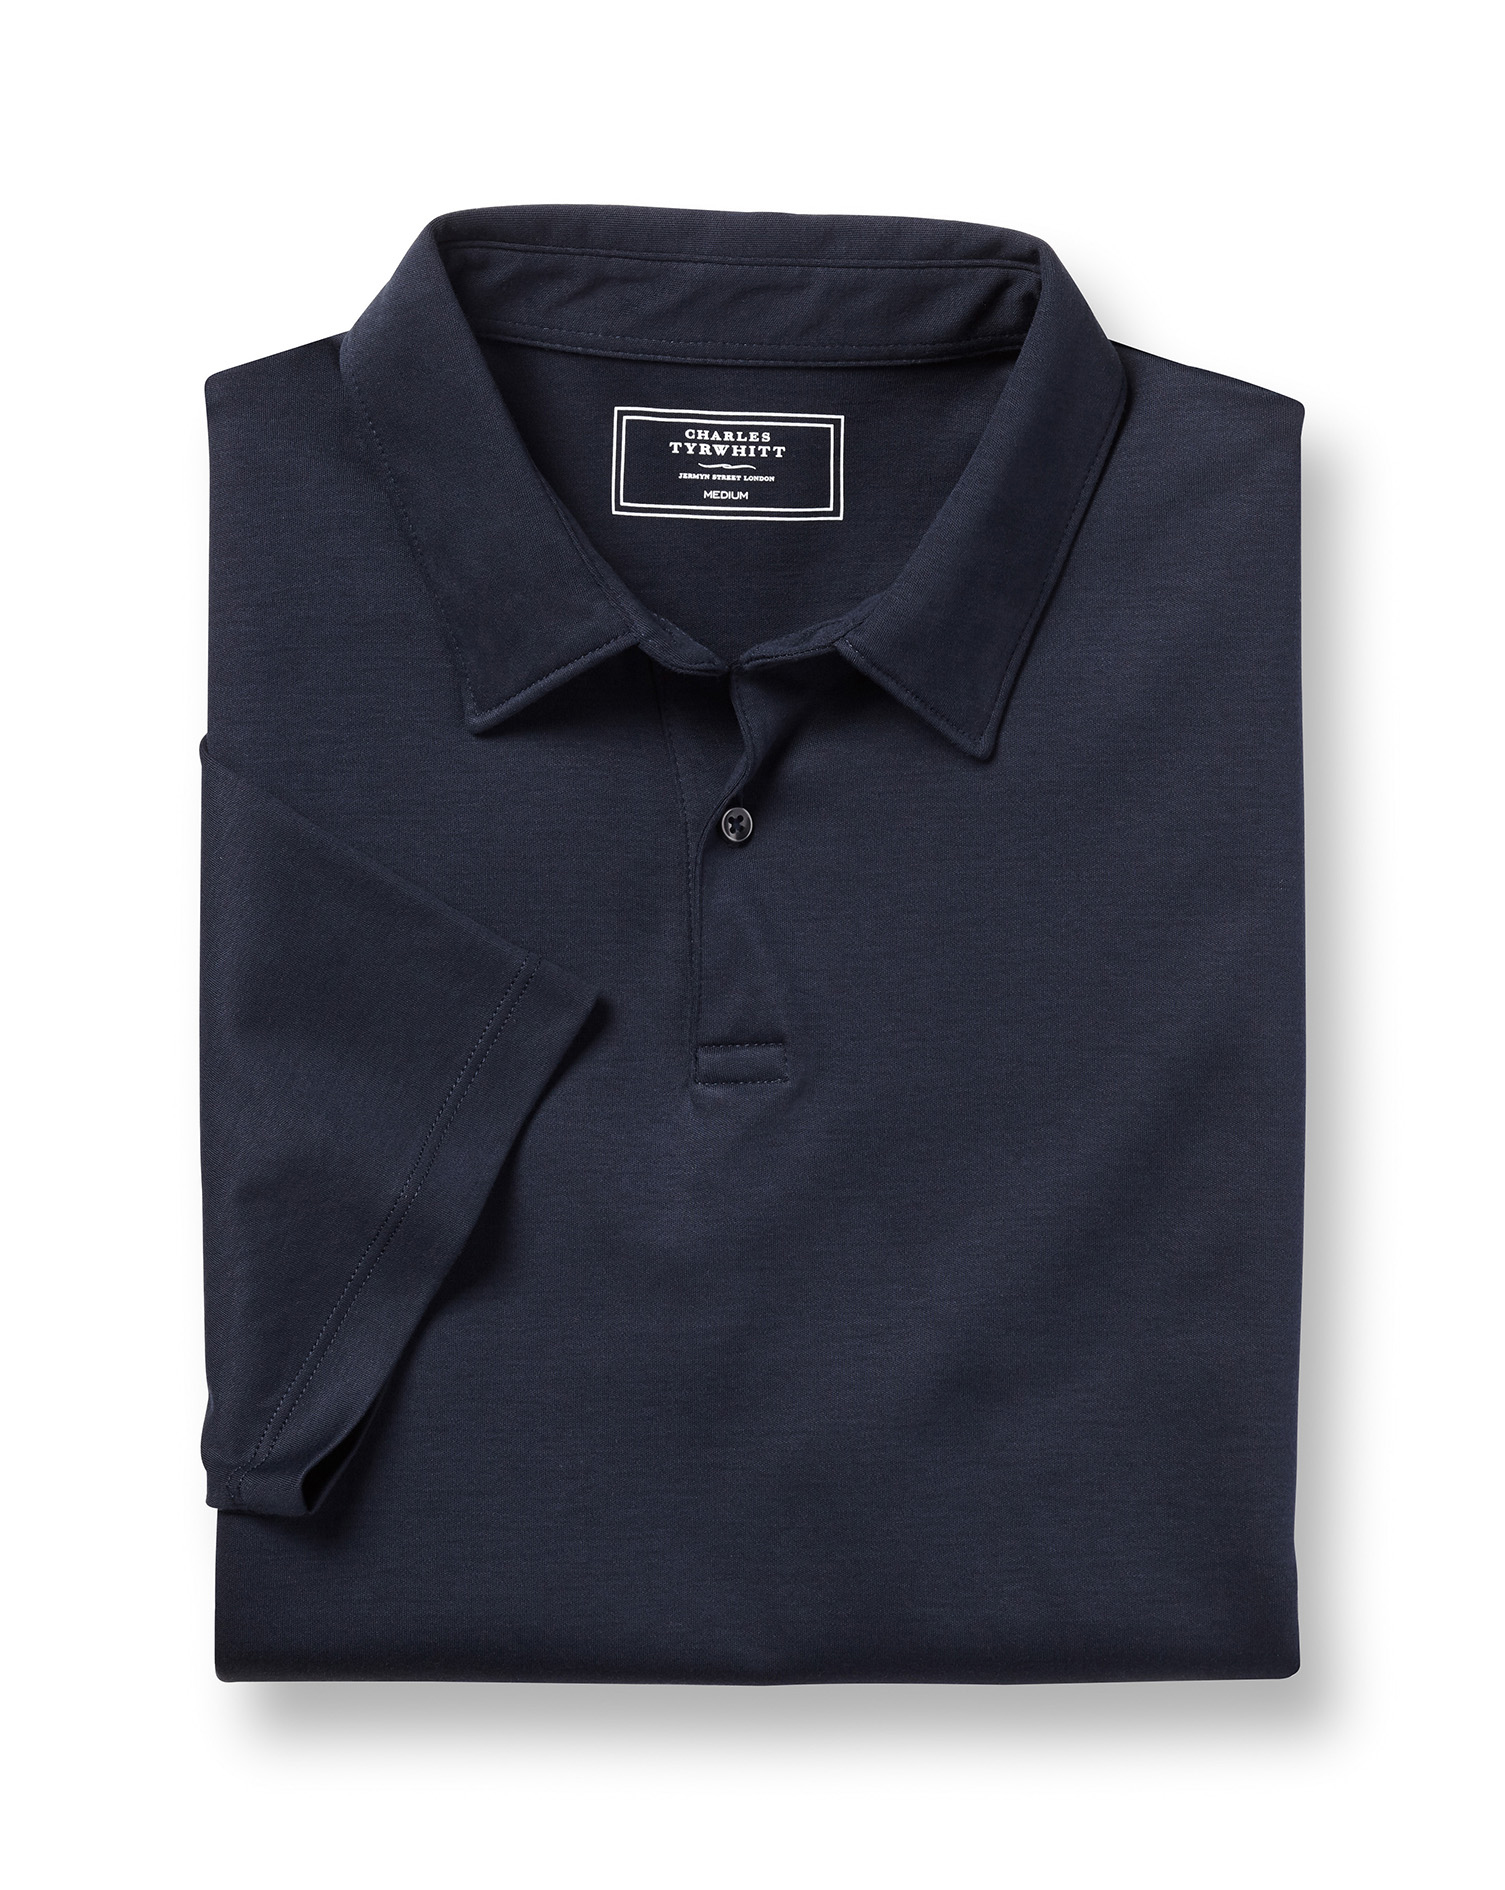 Plain Navy Jersey Cotton Polo Size XL by Charles Tyrwhitt